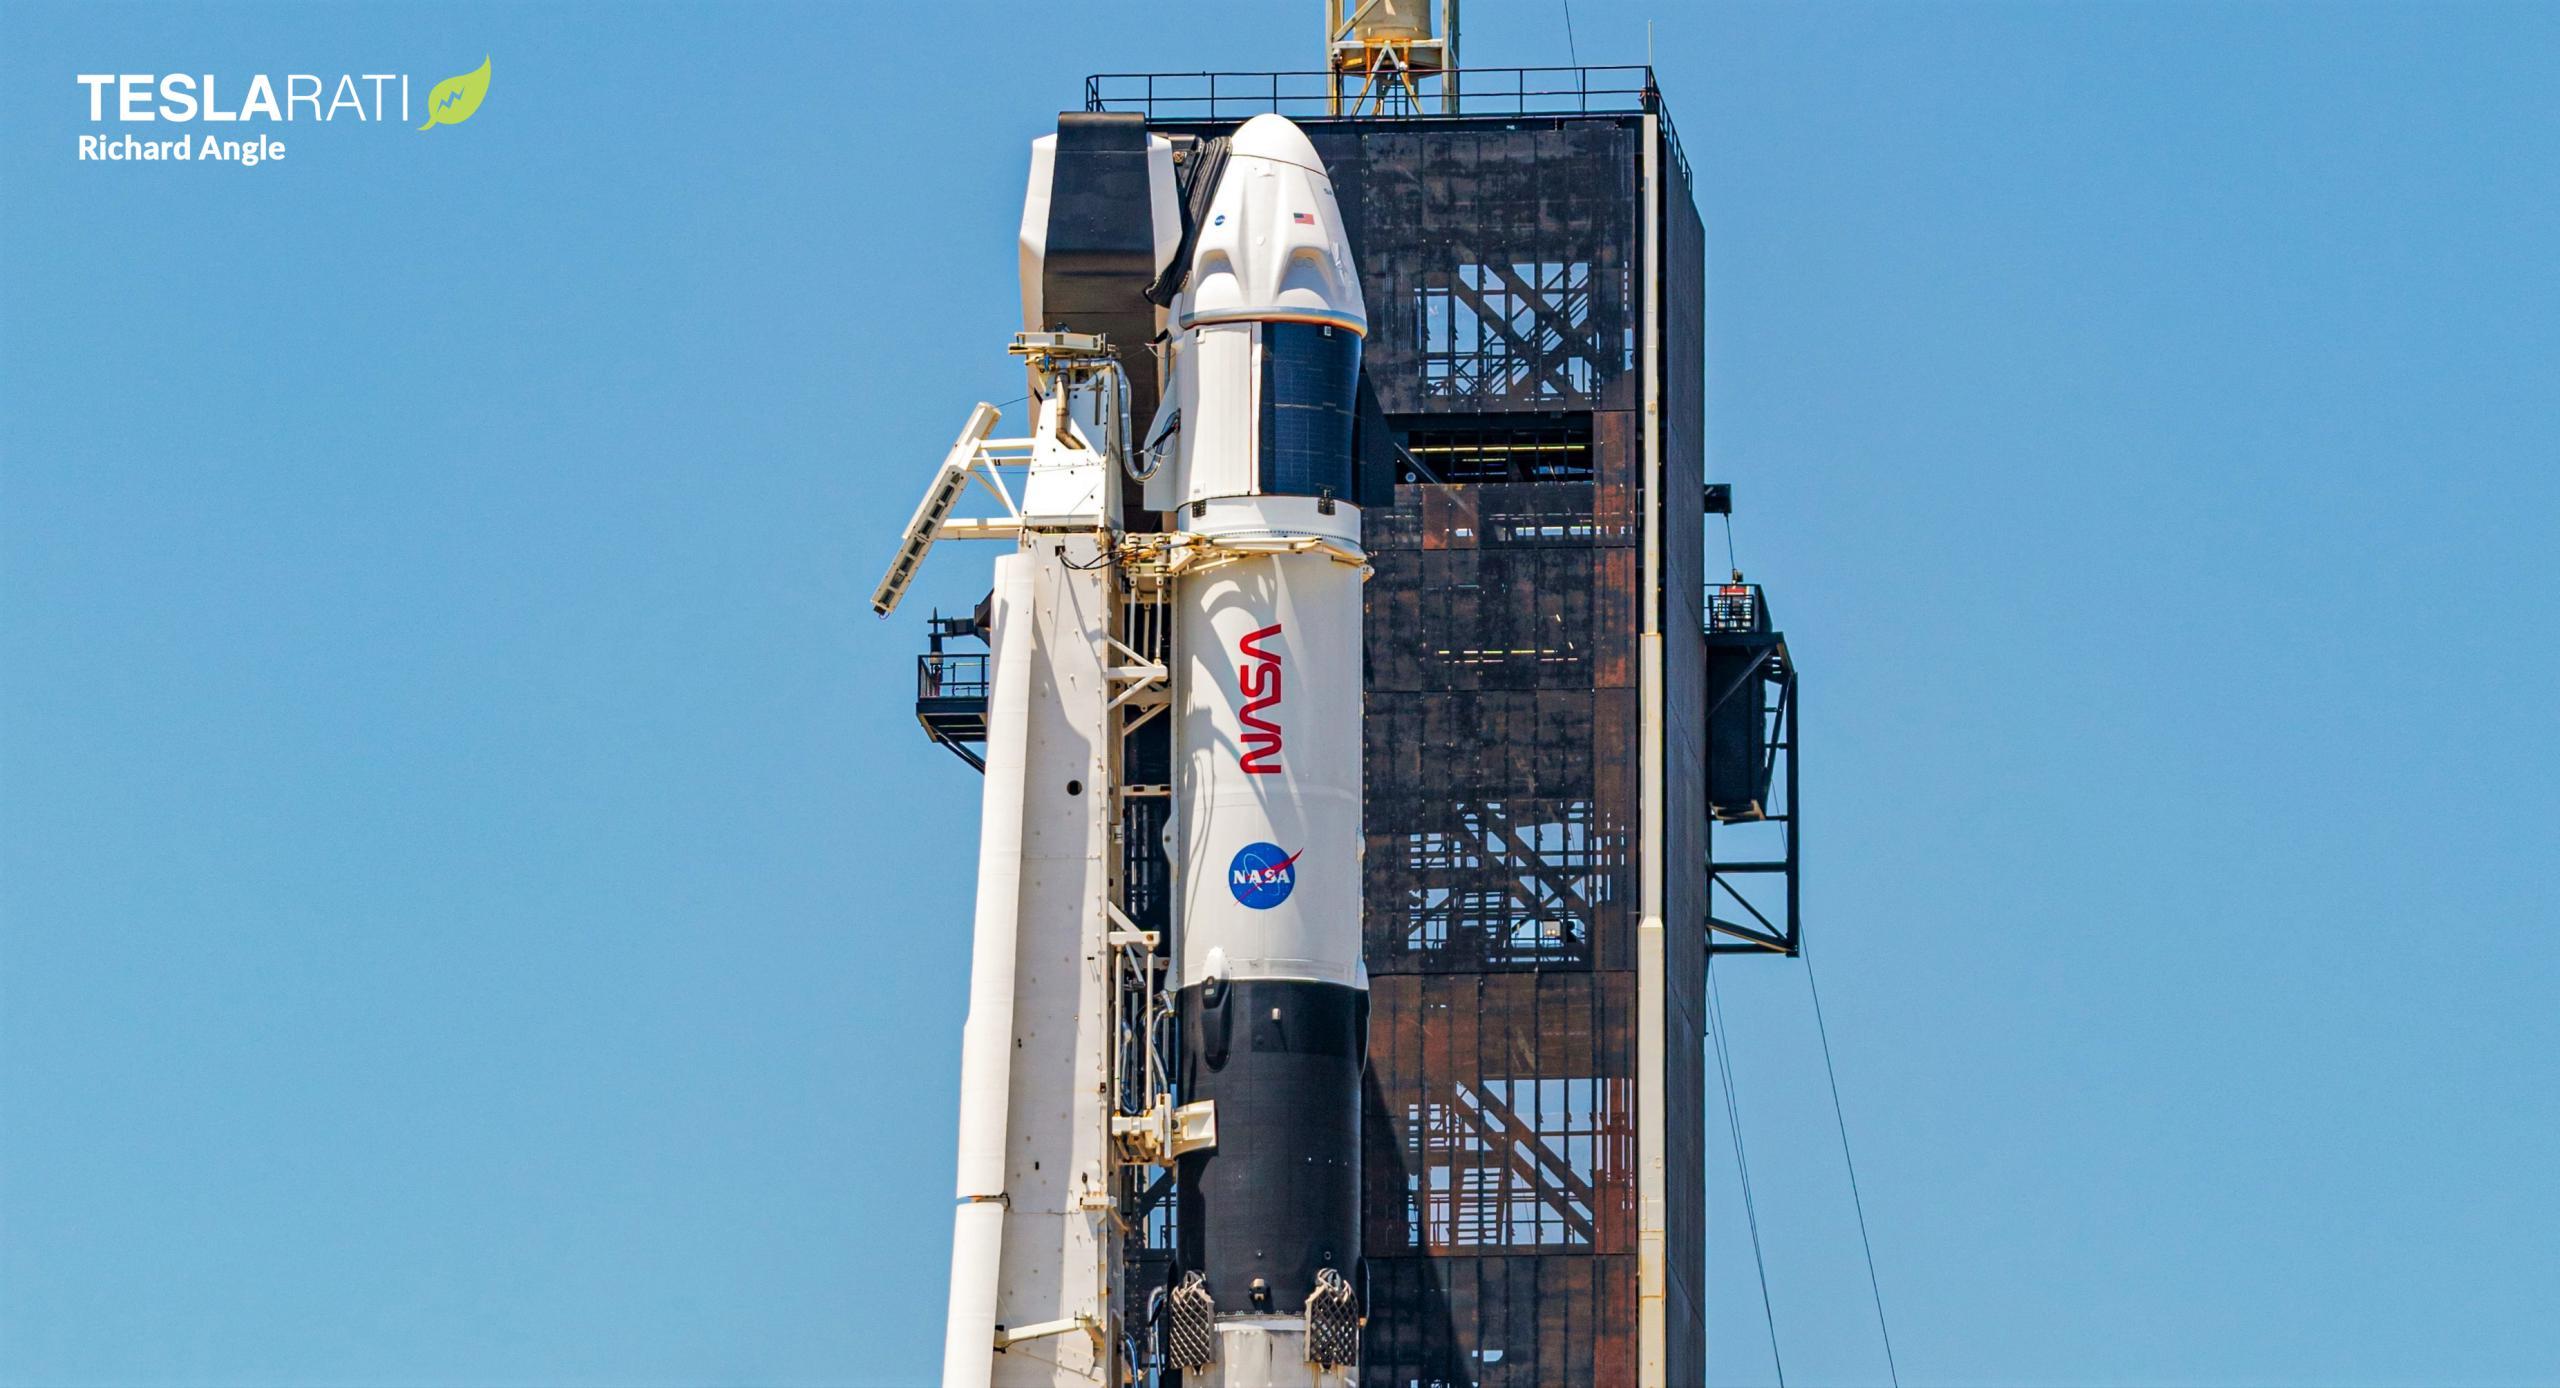 Crew-2 Crew Dragon C206 Falcon 9 B1061 39A 042221 (Richard Angle) 5 crop 4 (c)